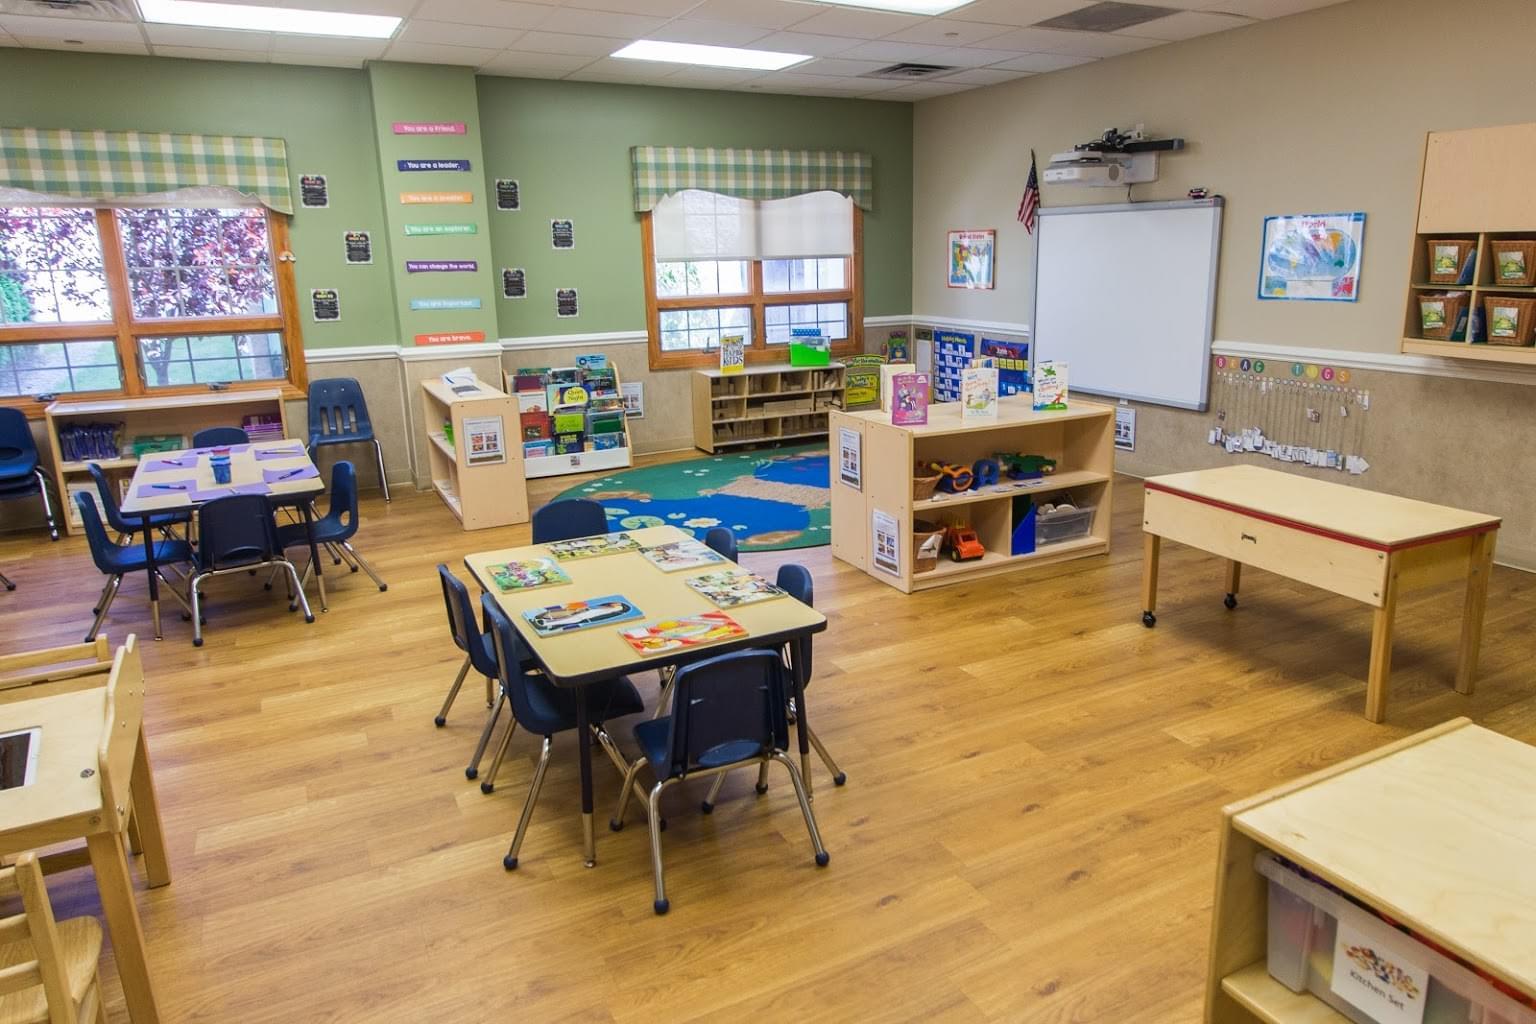 Lightbridge Academy pre-school and daycare classroom in Westwood, NJ